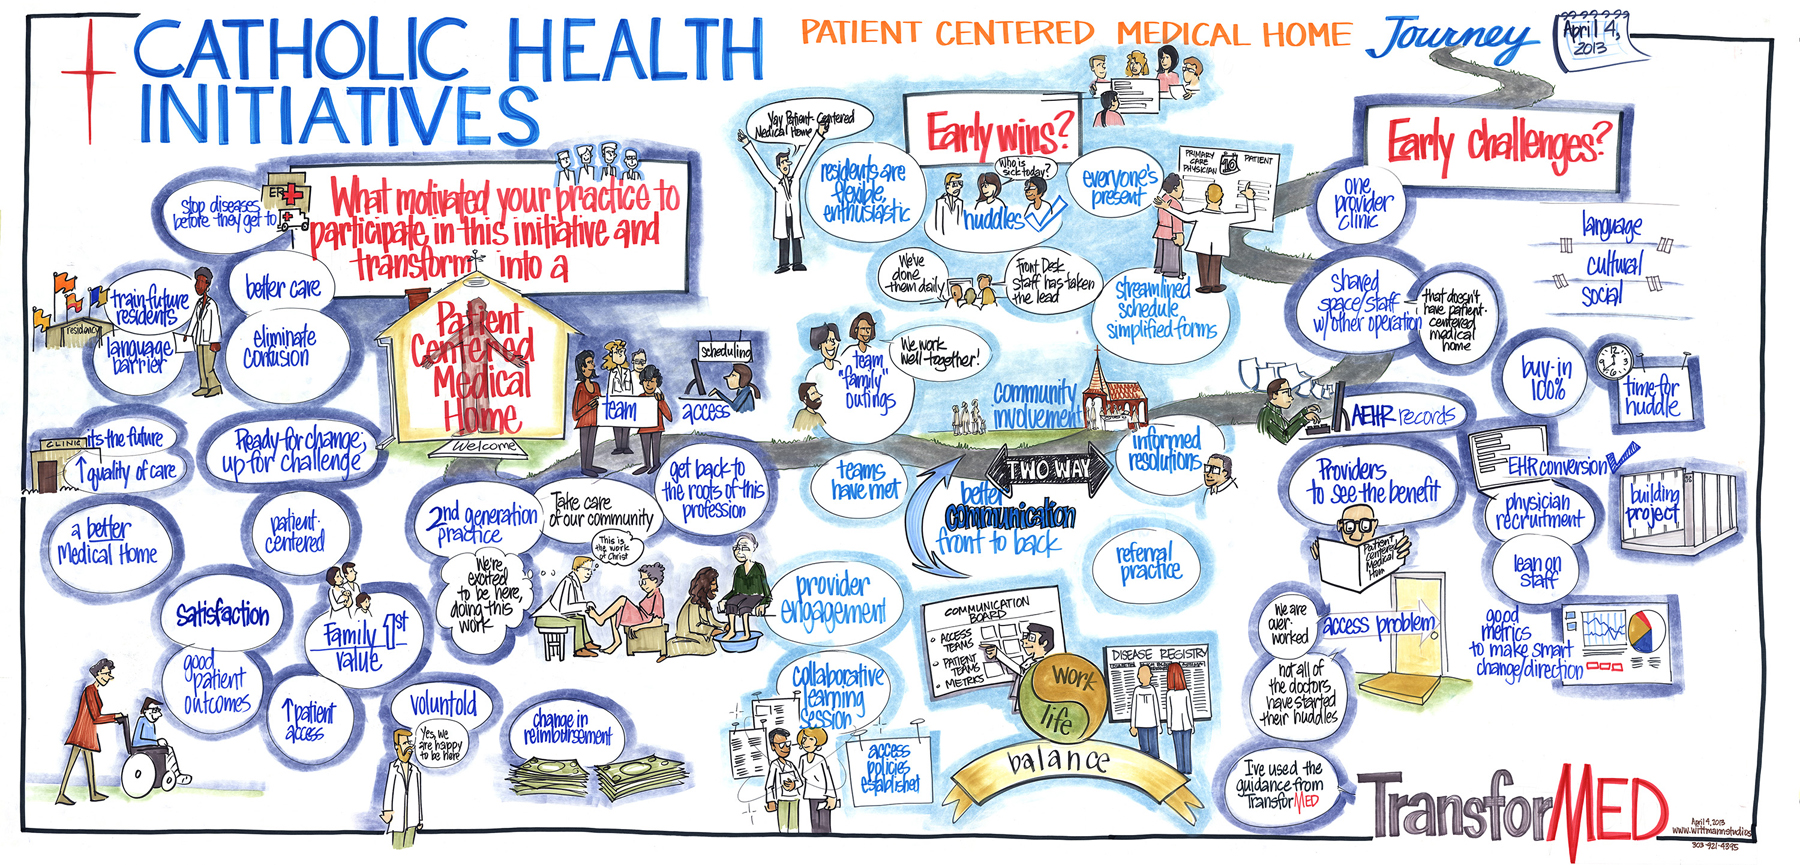 catholic health initiatives -001 3m.jpg